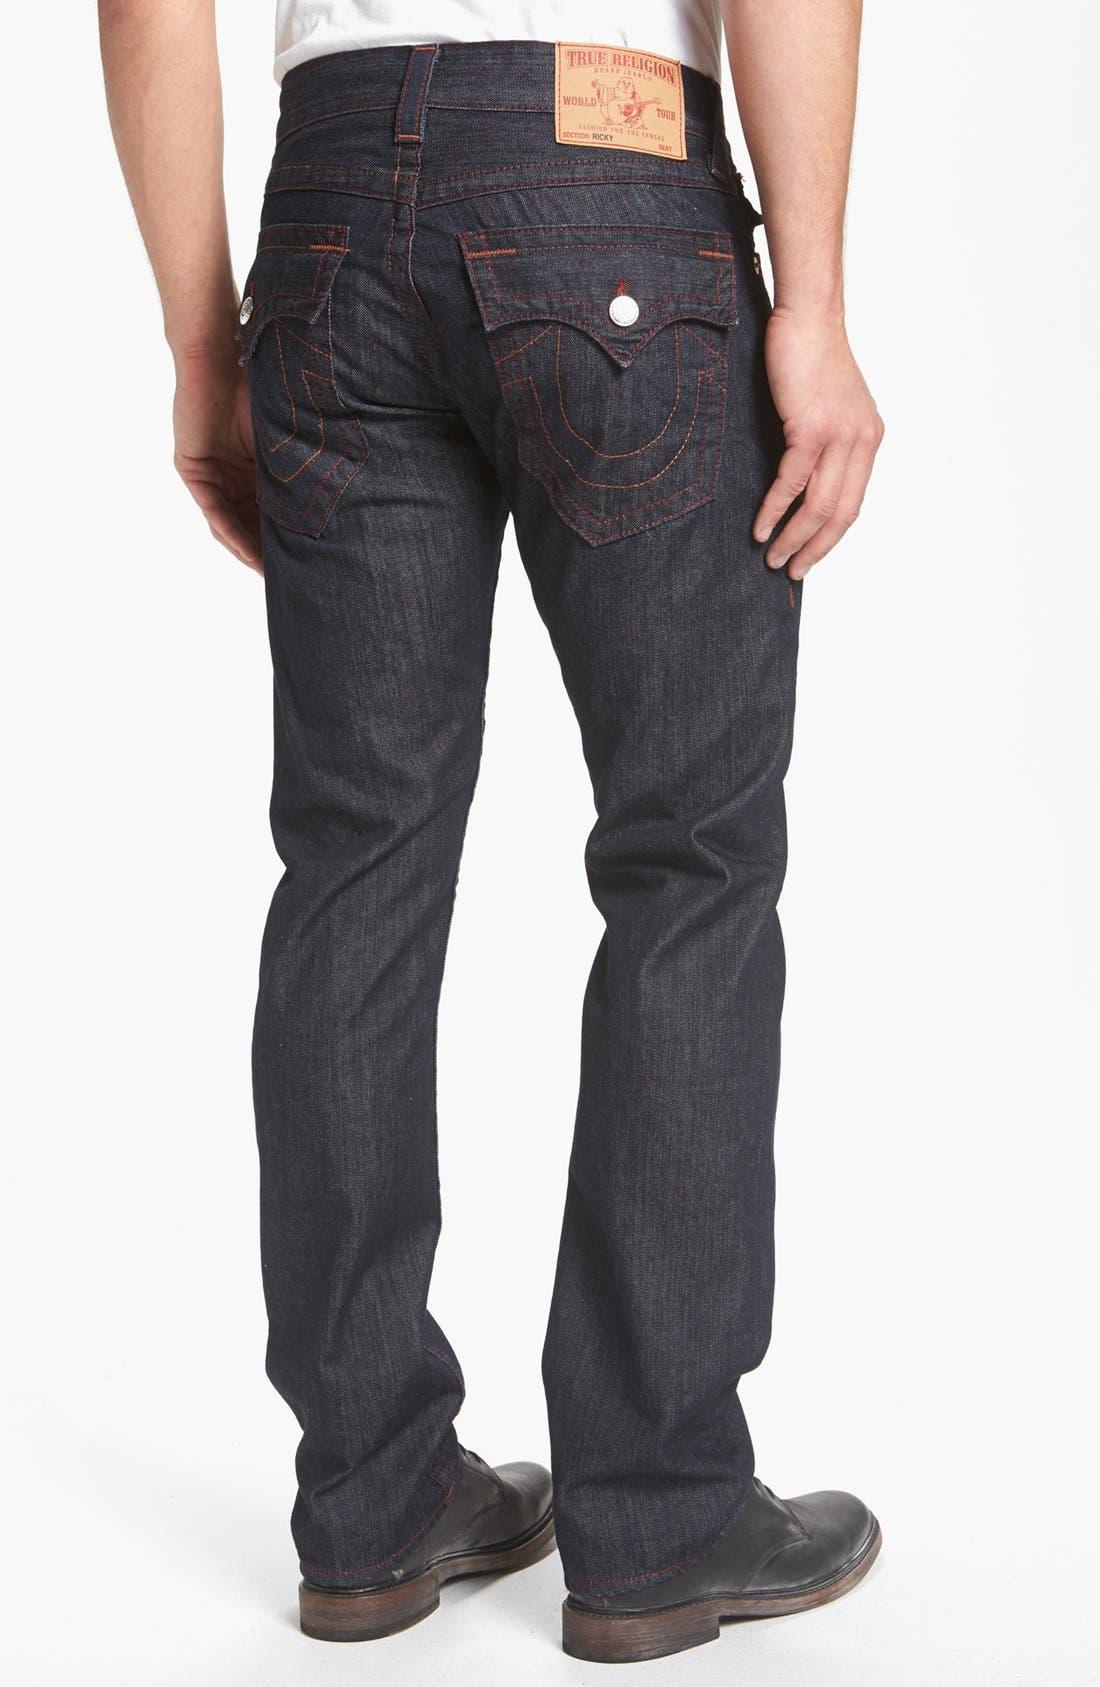 Main Image - True Religion Brand Jeans 'Ricky' Straight Leg Jeans (Body Rinse)